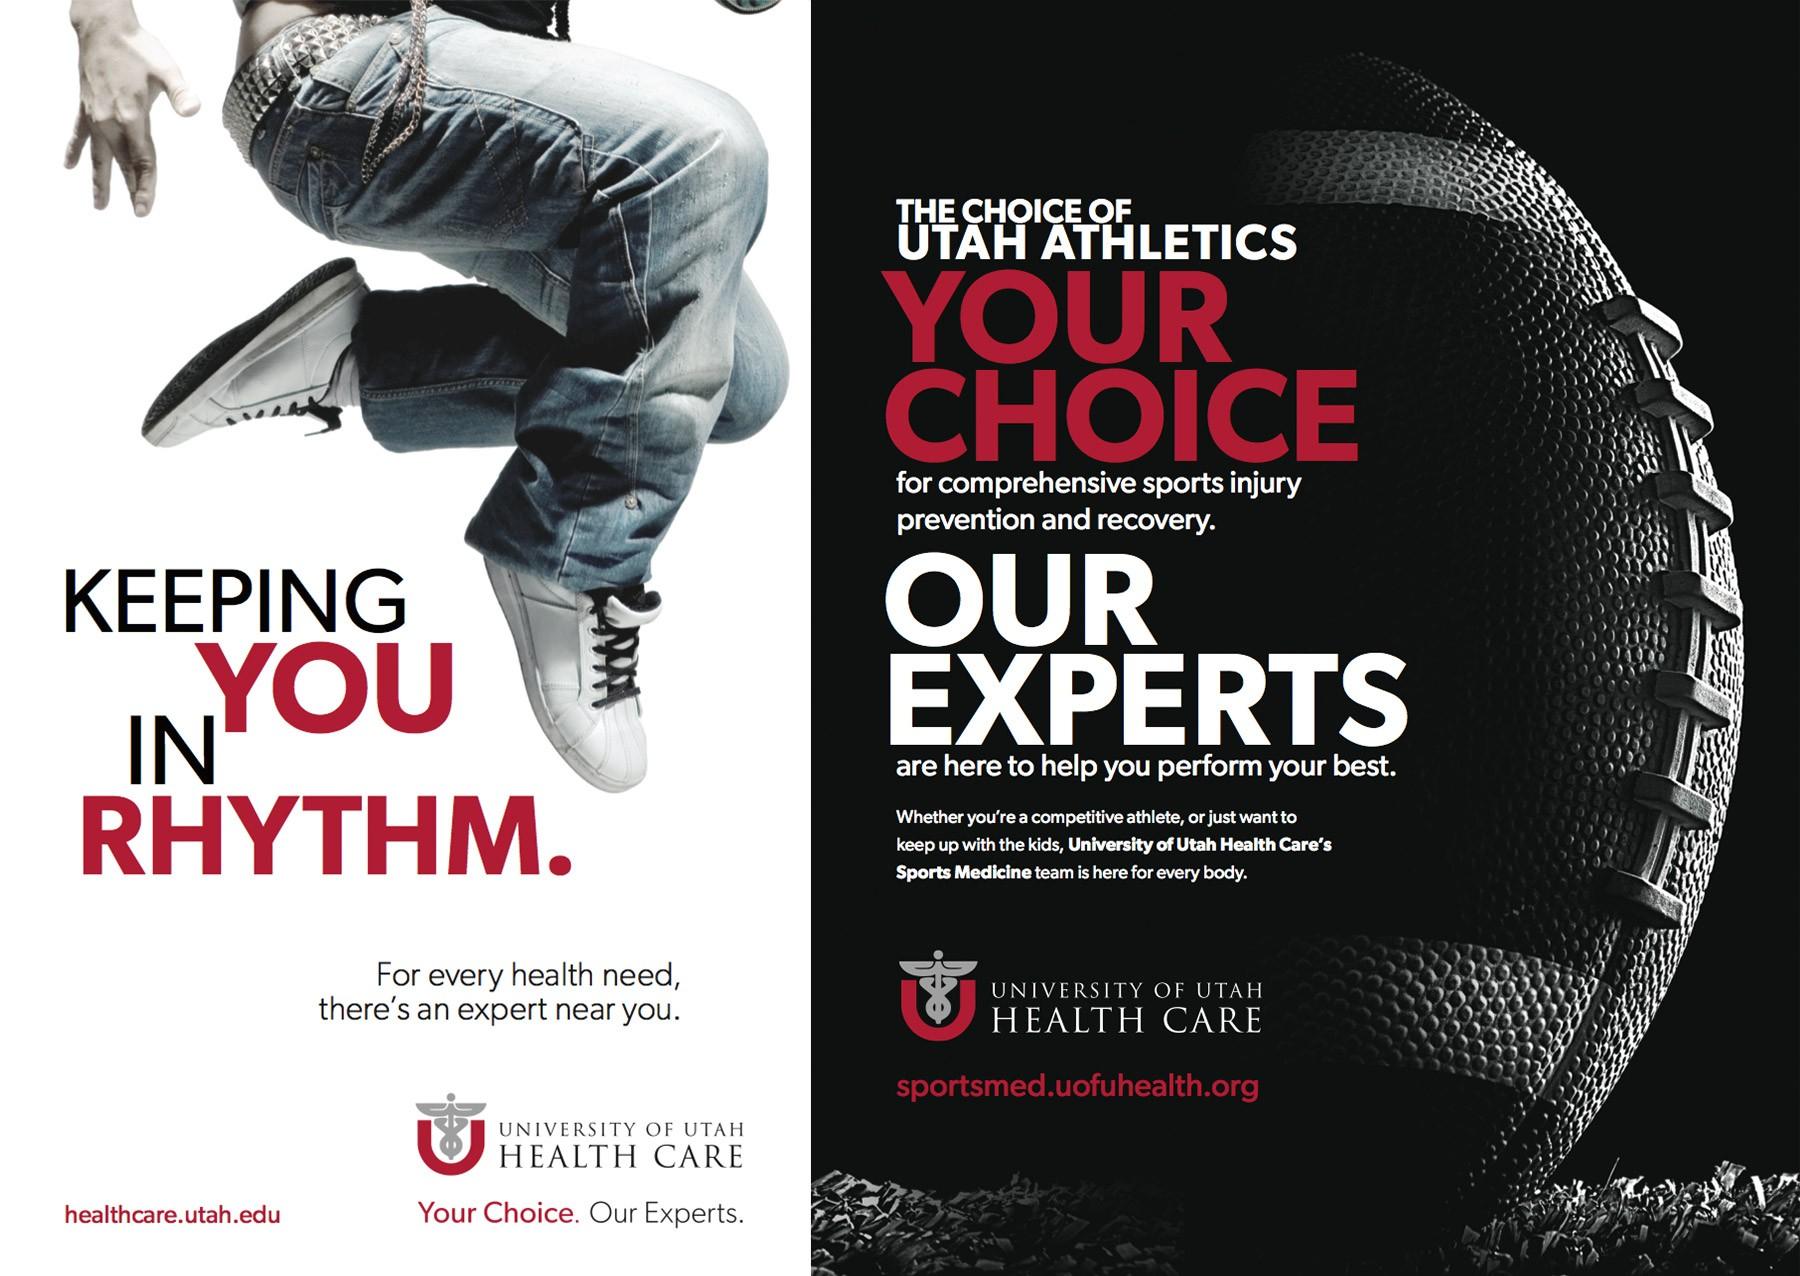 University of Utah Healthcare promotional images